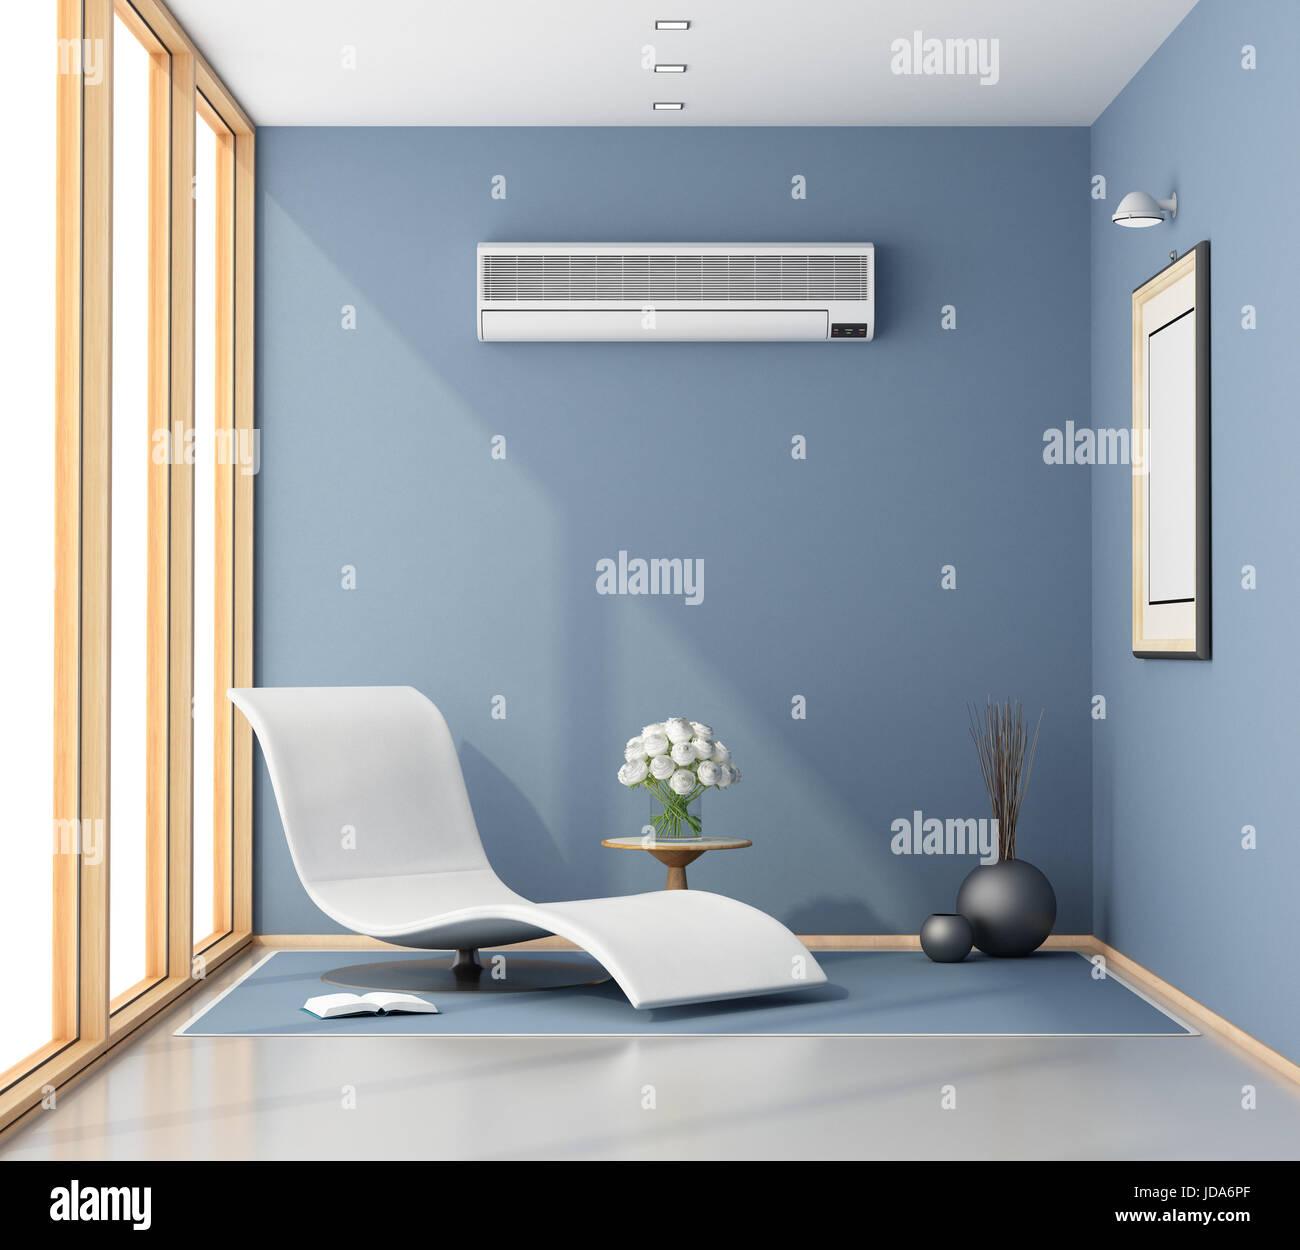 3d Rendering Blue Room Window Stockfotos & 3d Rendering Blue Room ...